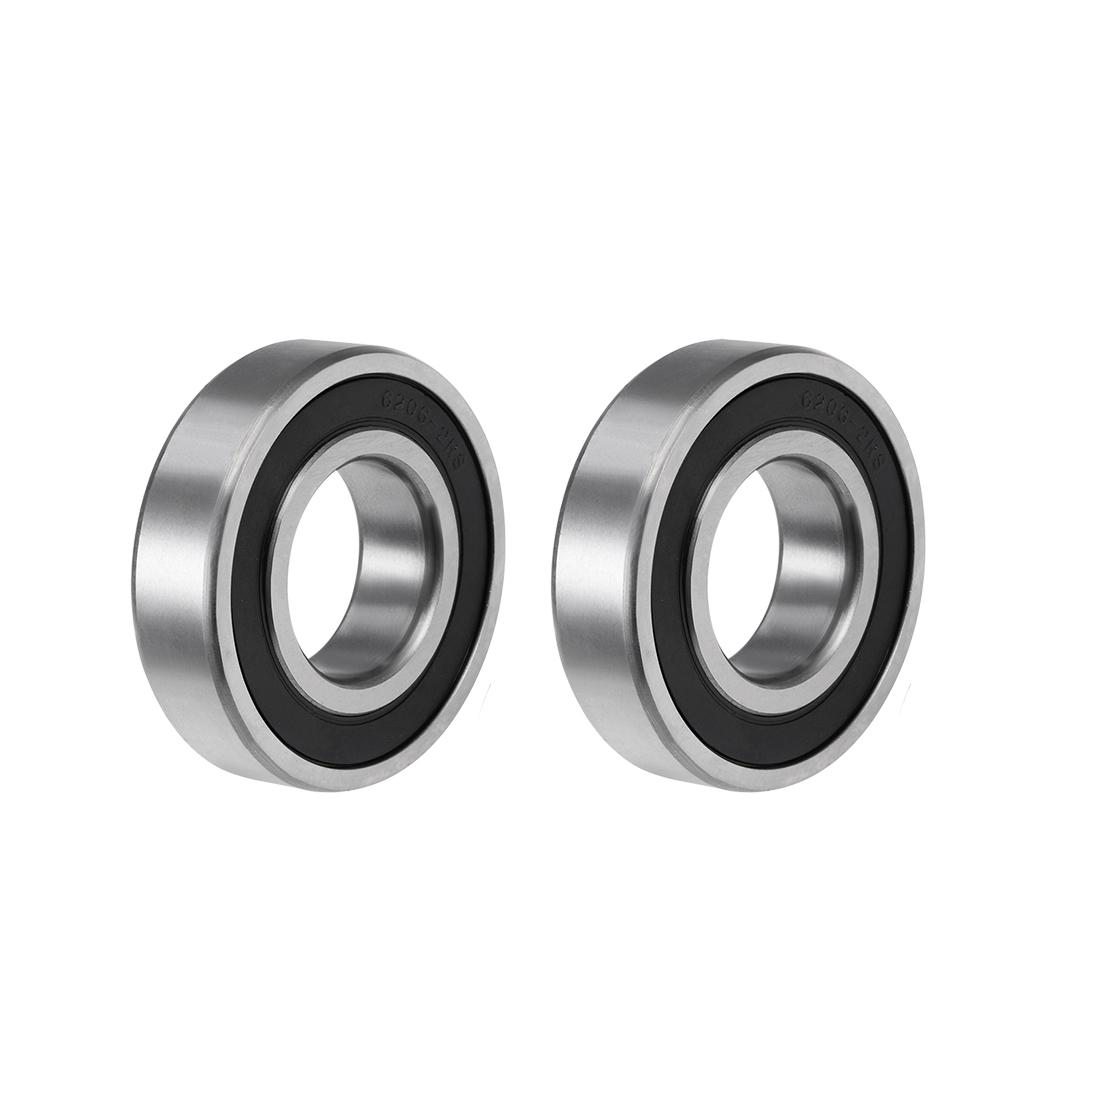 6206-2RS Ball Bearing 30x62x16mm Double Sealed ABEC-3 Bearings 2pcs